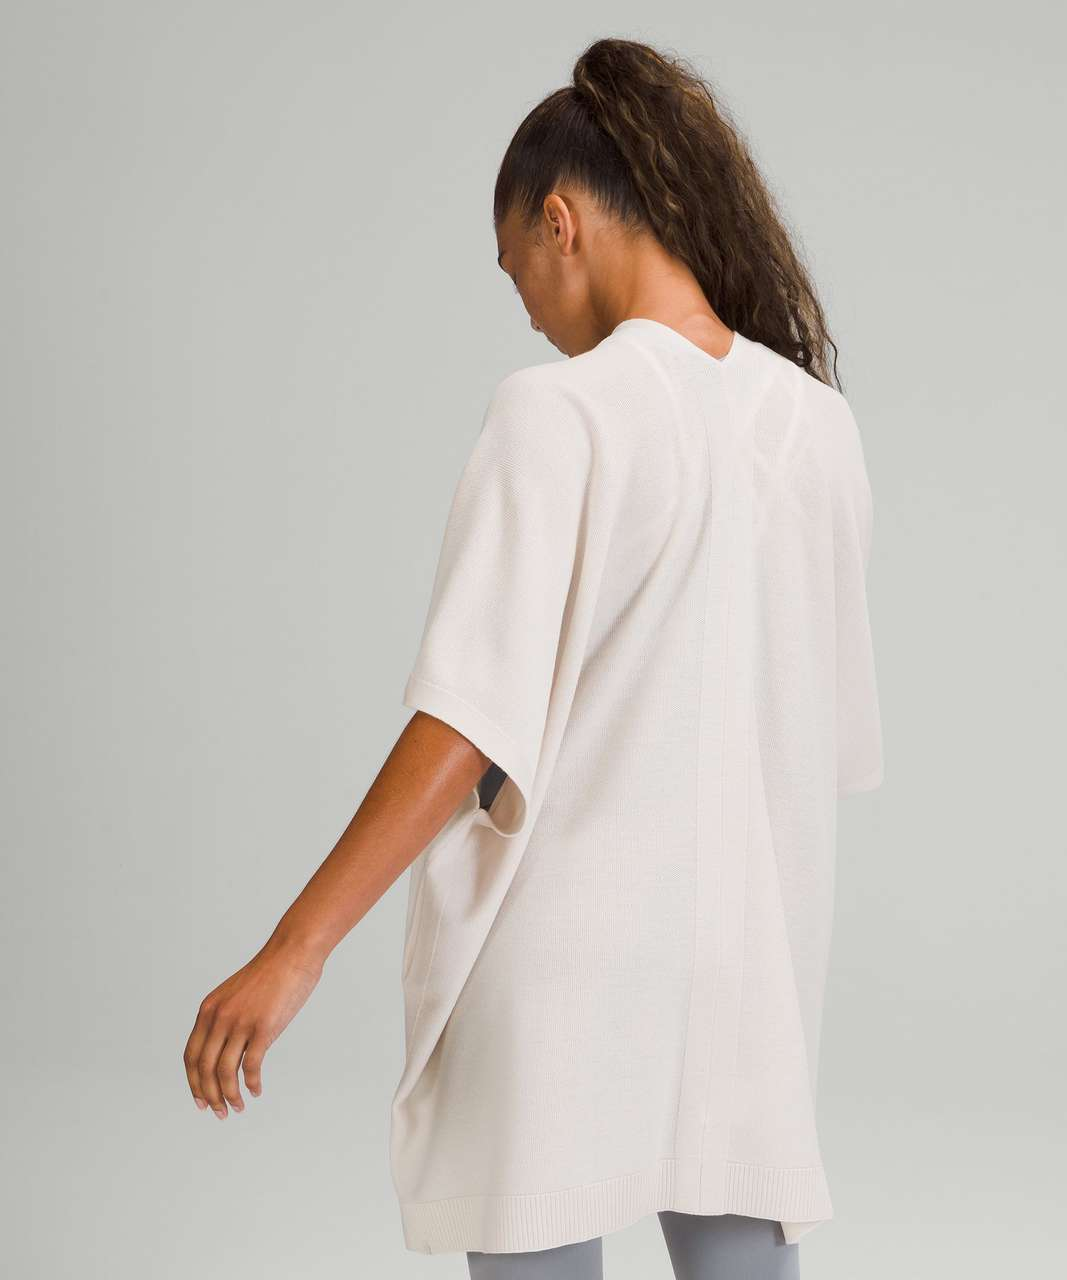 Lululemon Merino Wool Short Sleeve Wrap - White Opal